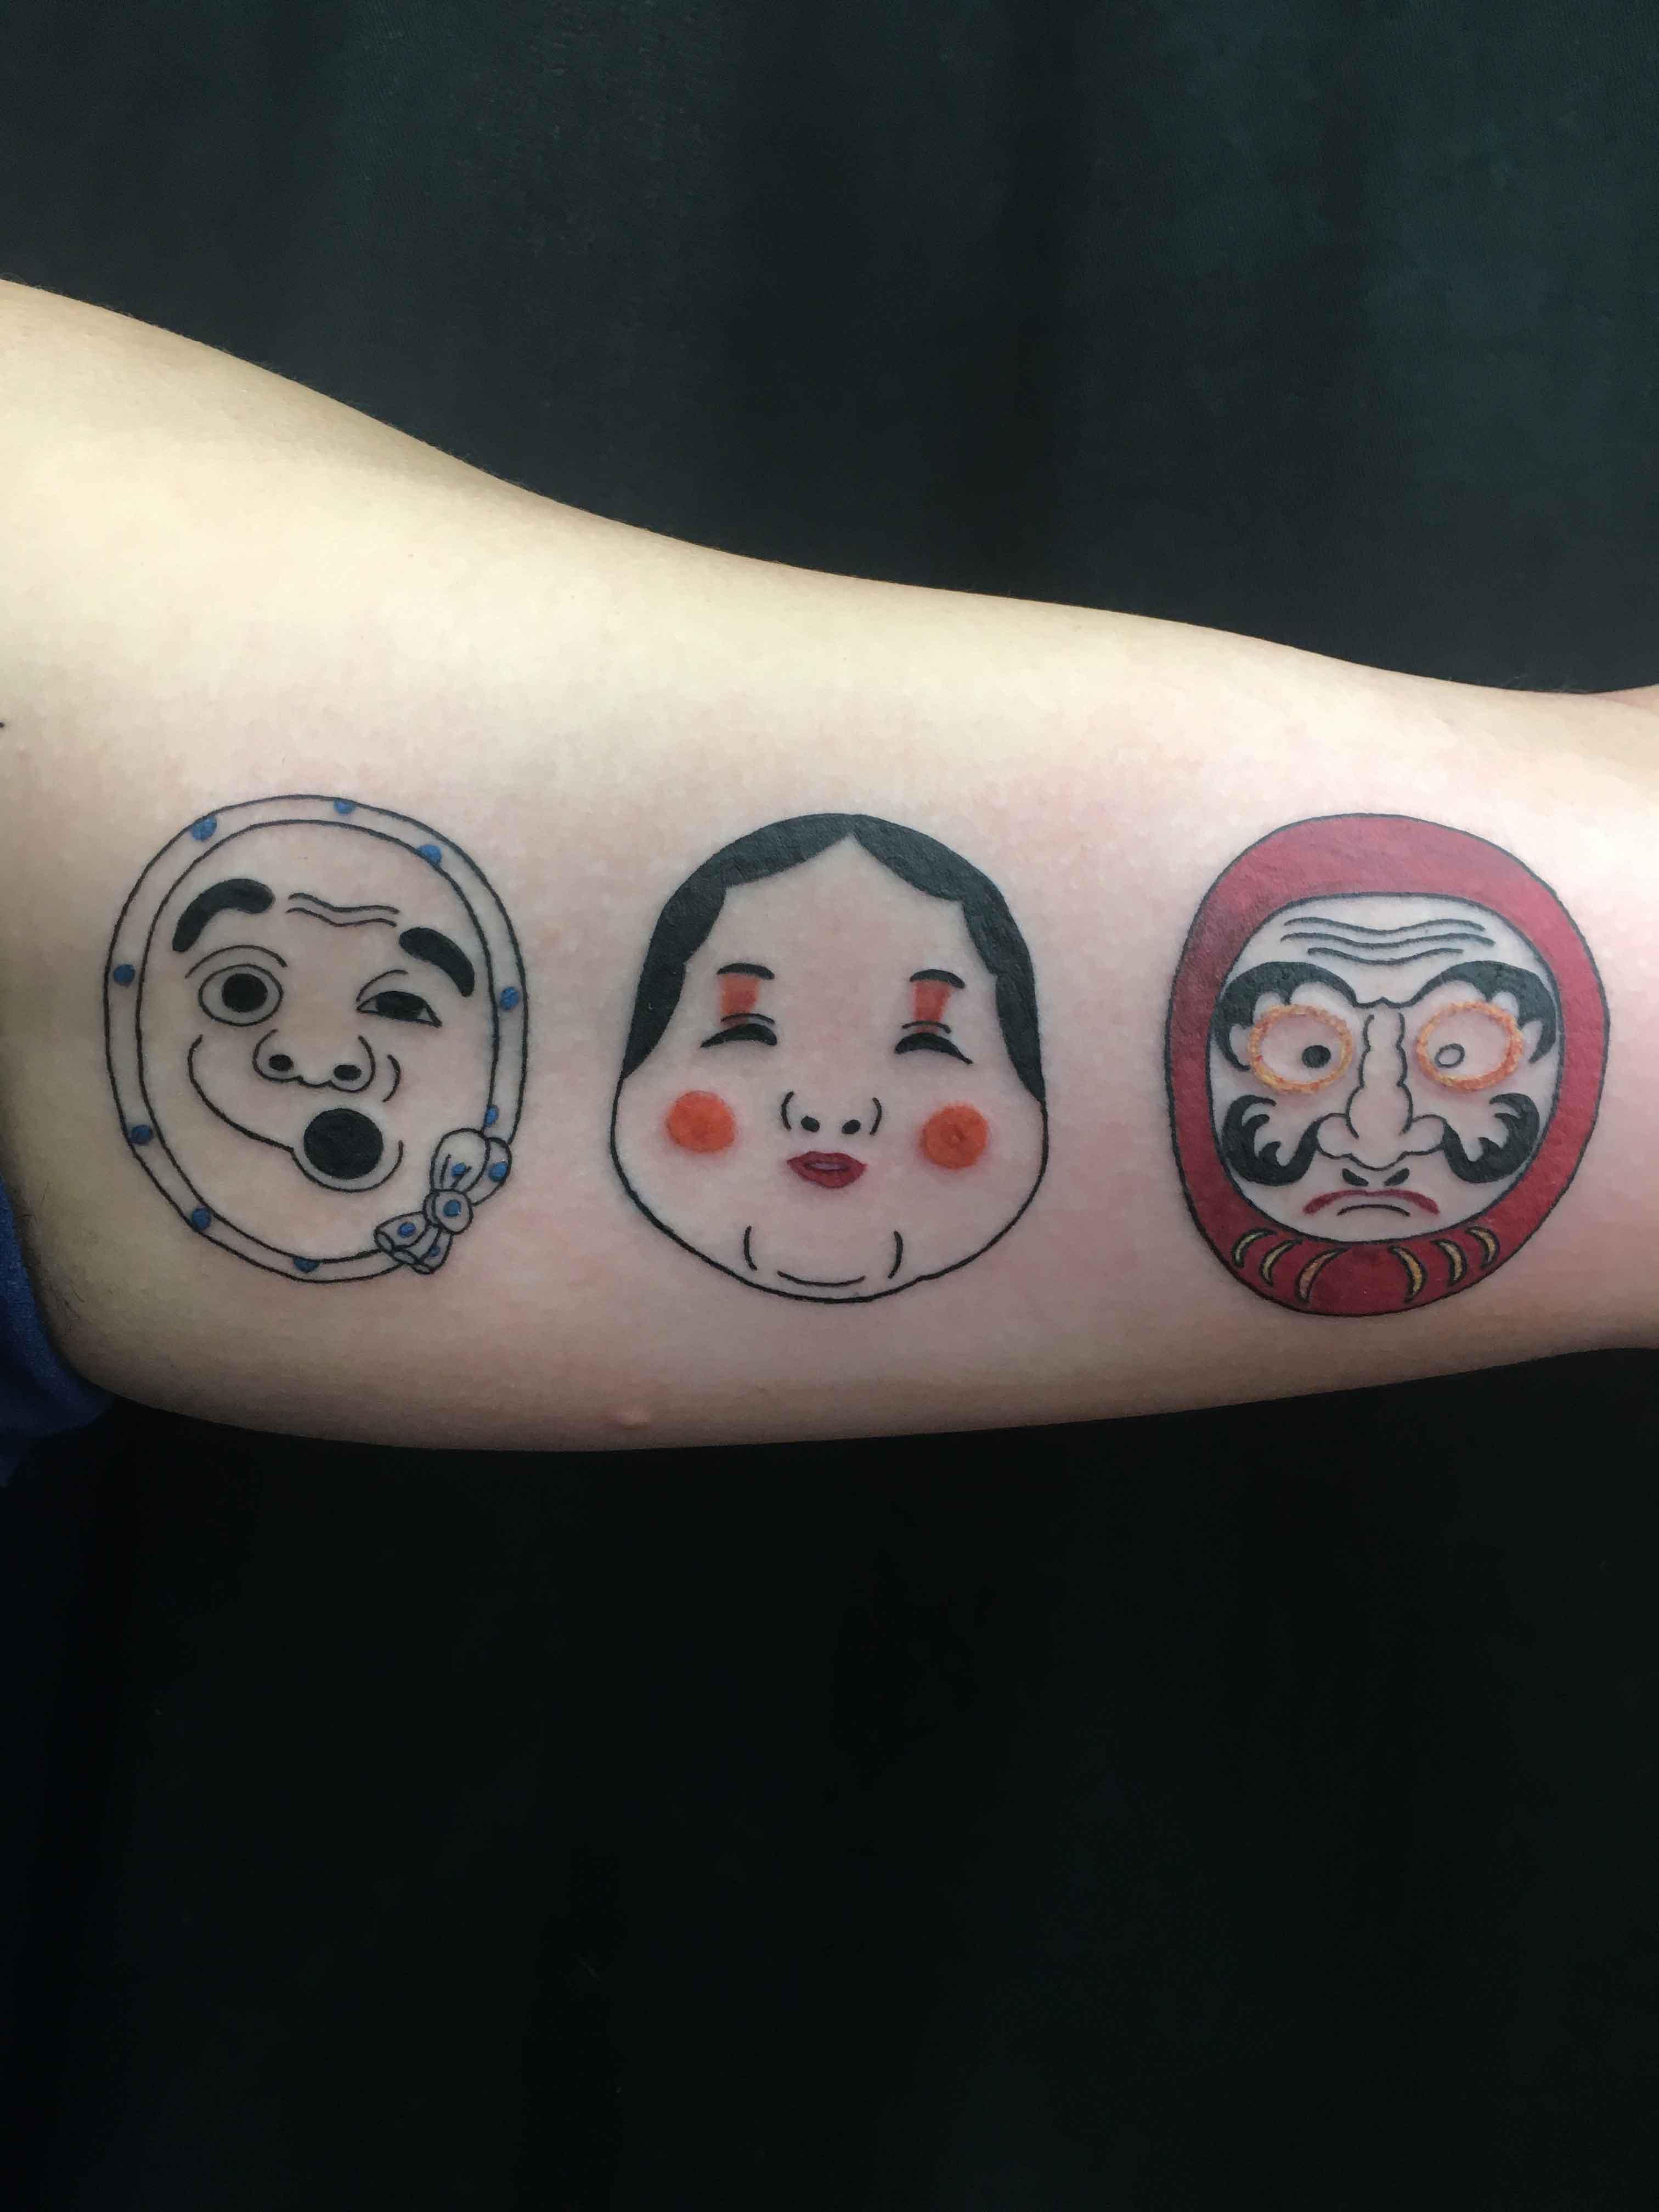 japanese cartoon faces by Ei Omiya at Funhouse Tattoo in San Diego